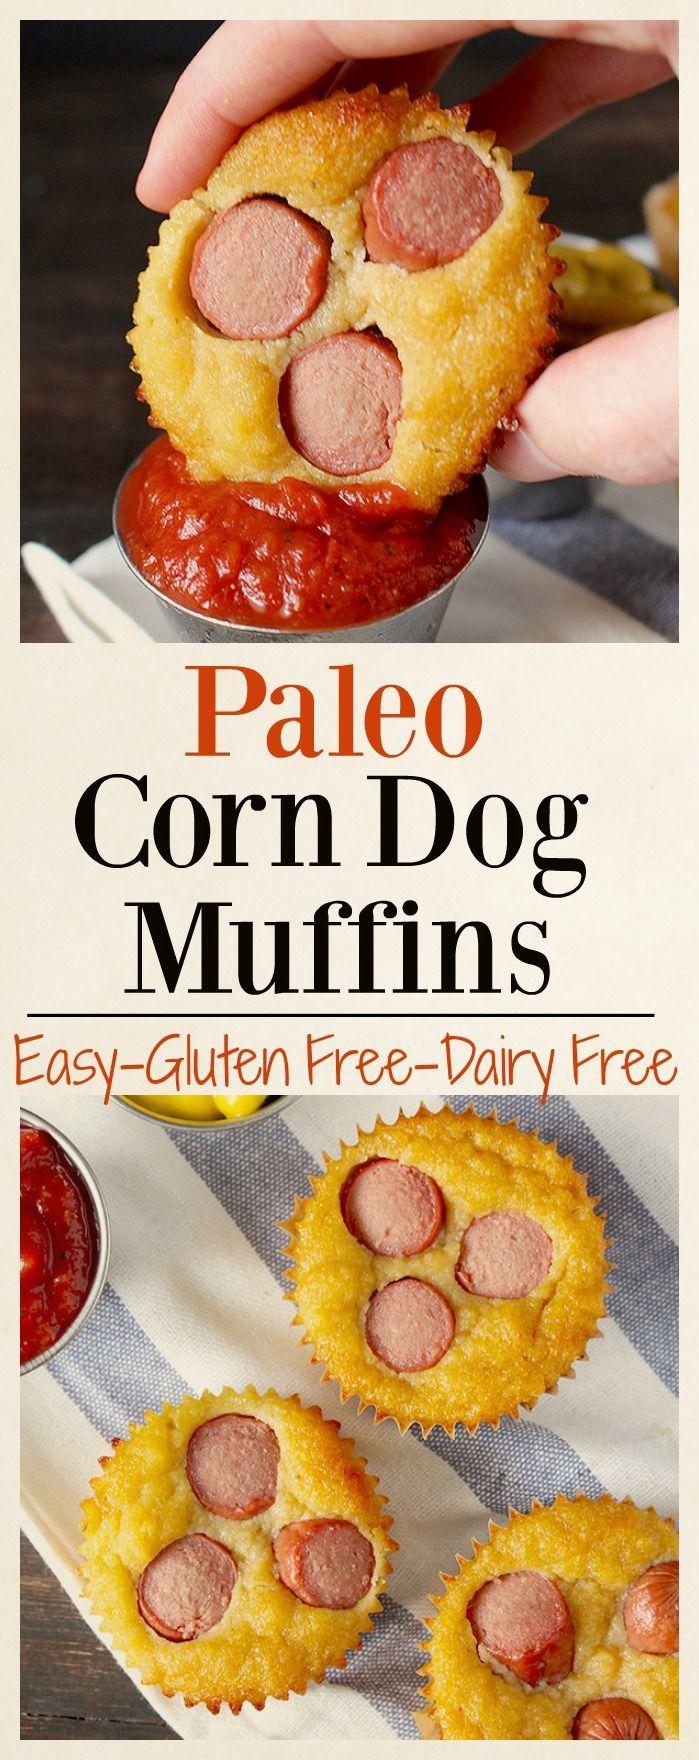 ... Corn dog batter on Pinterest | Corn dogs near me, Fried dog and Baked